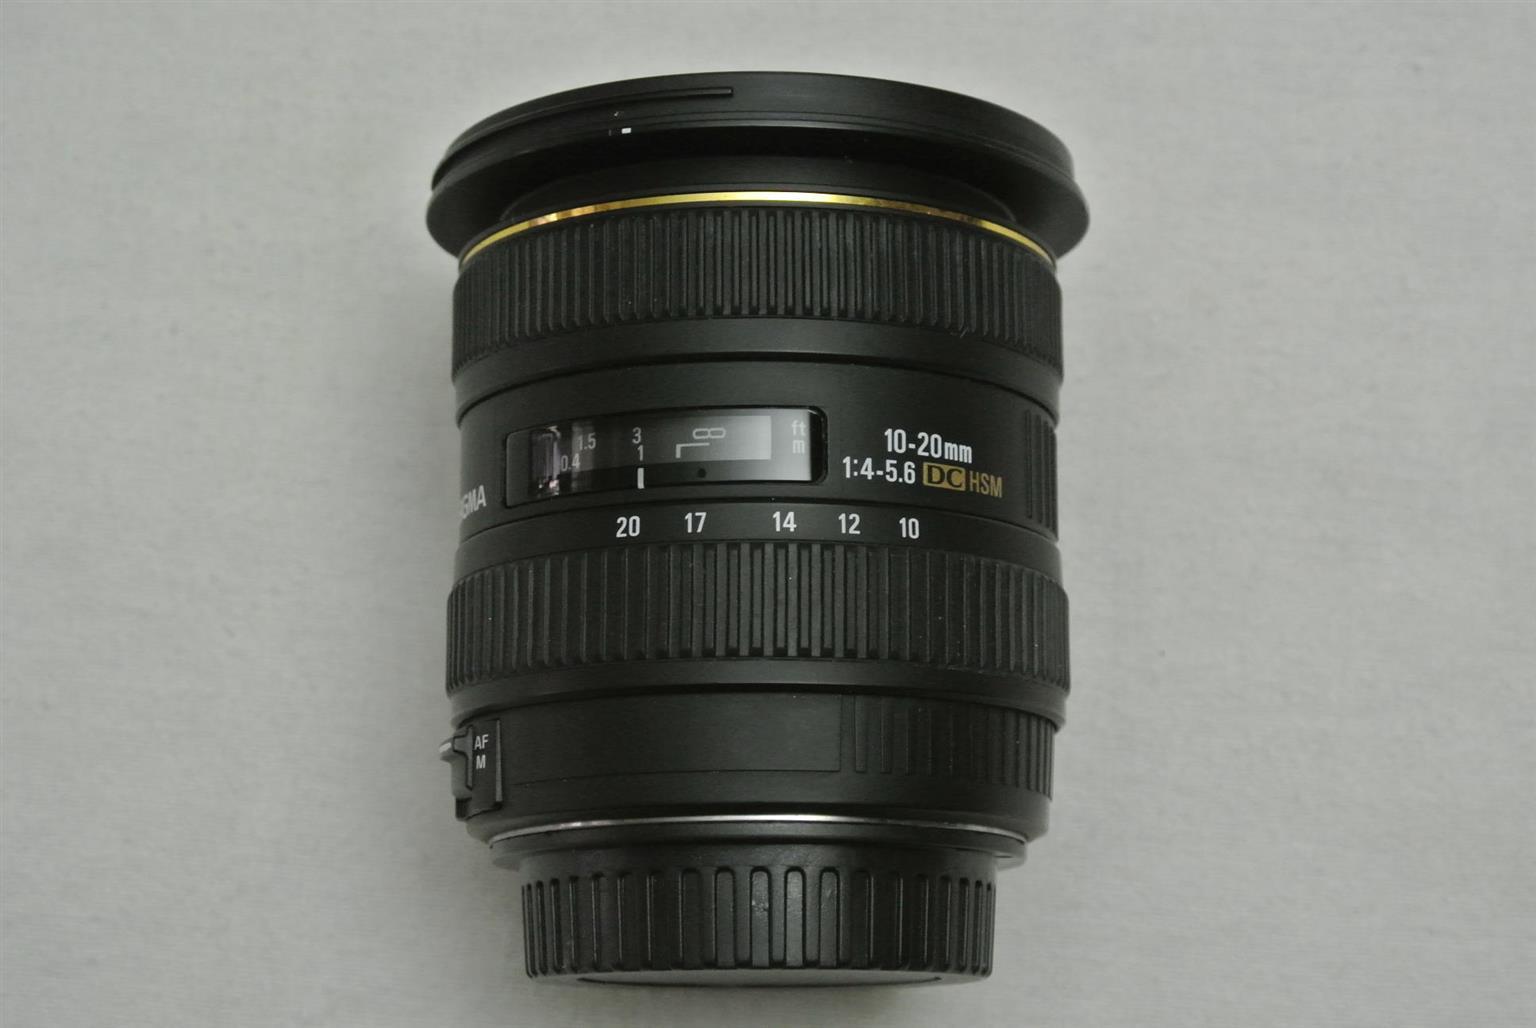 Sigma 10-20mm f/4-5.6 EX DC HSM Lens for Nikon DSLR Cameras - WIDE ANGLE